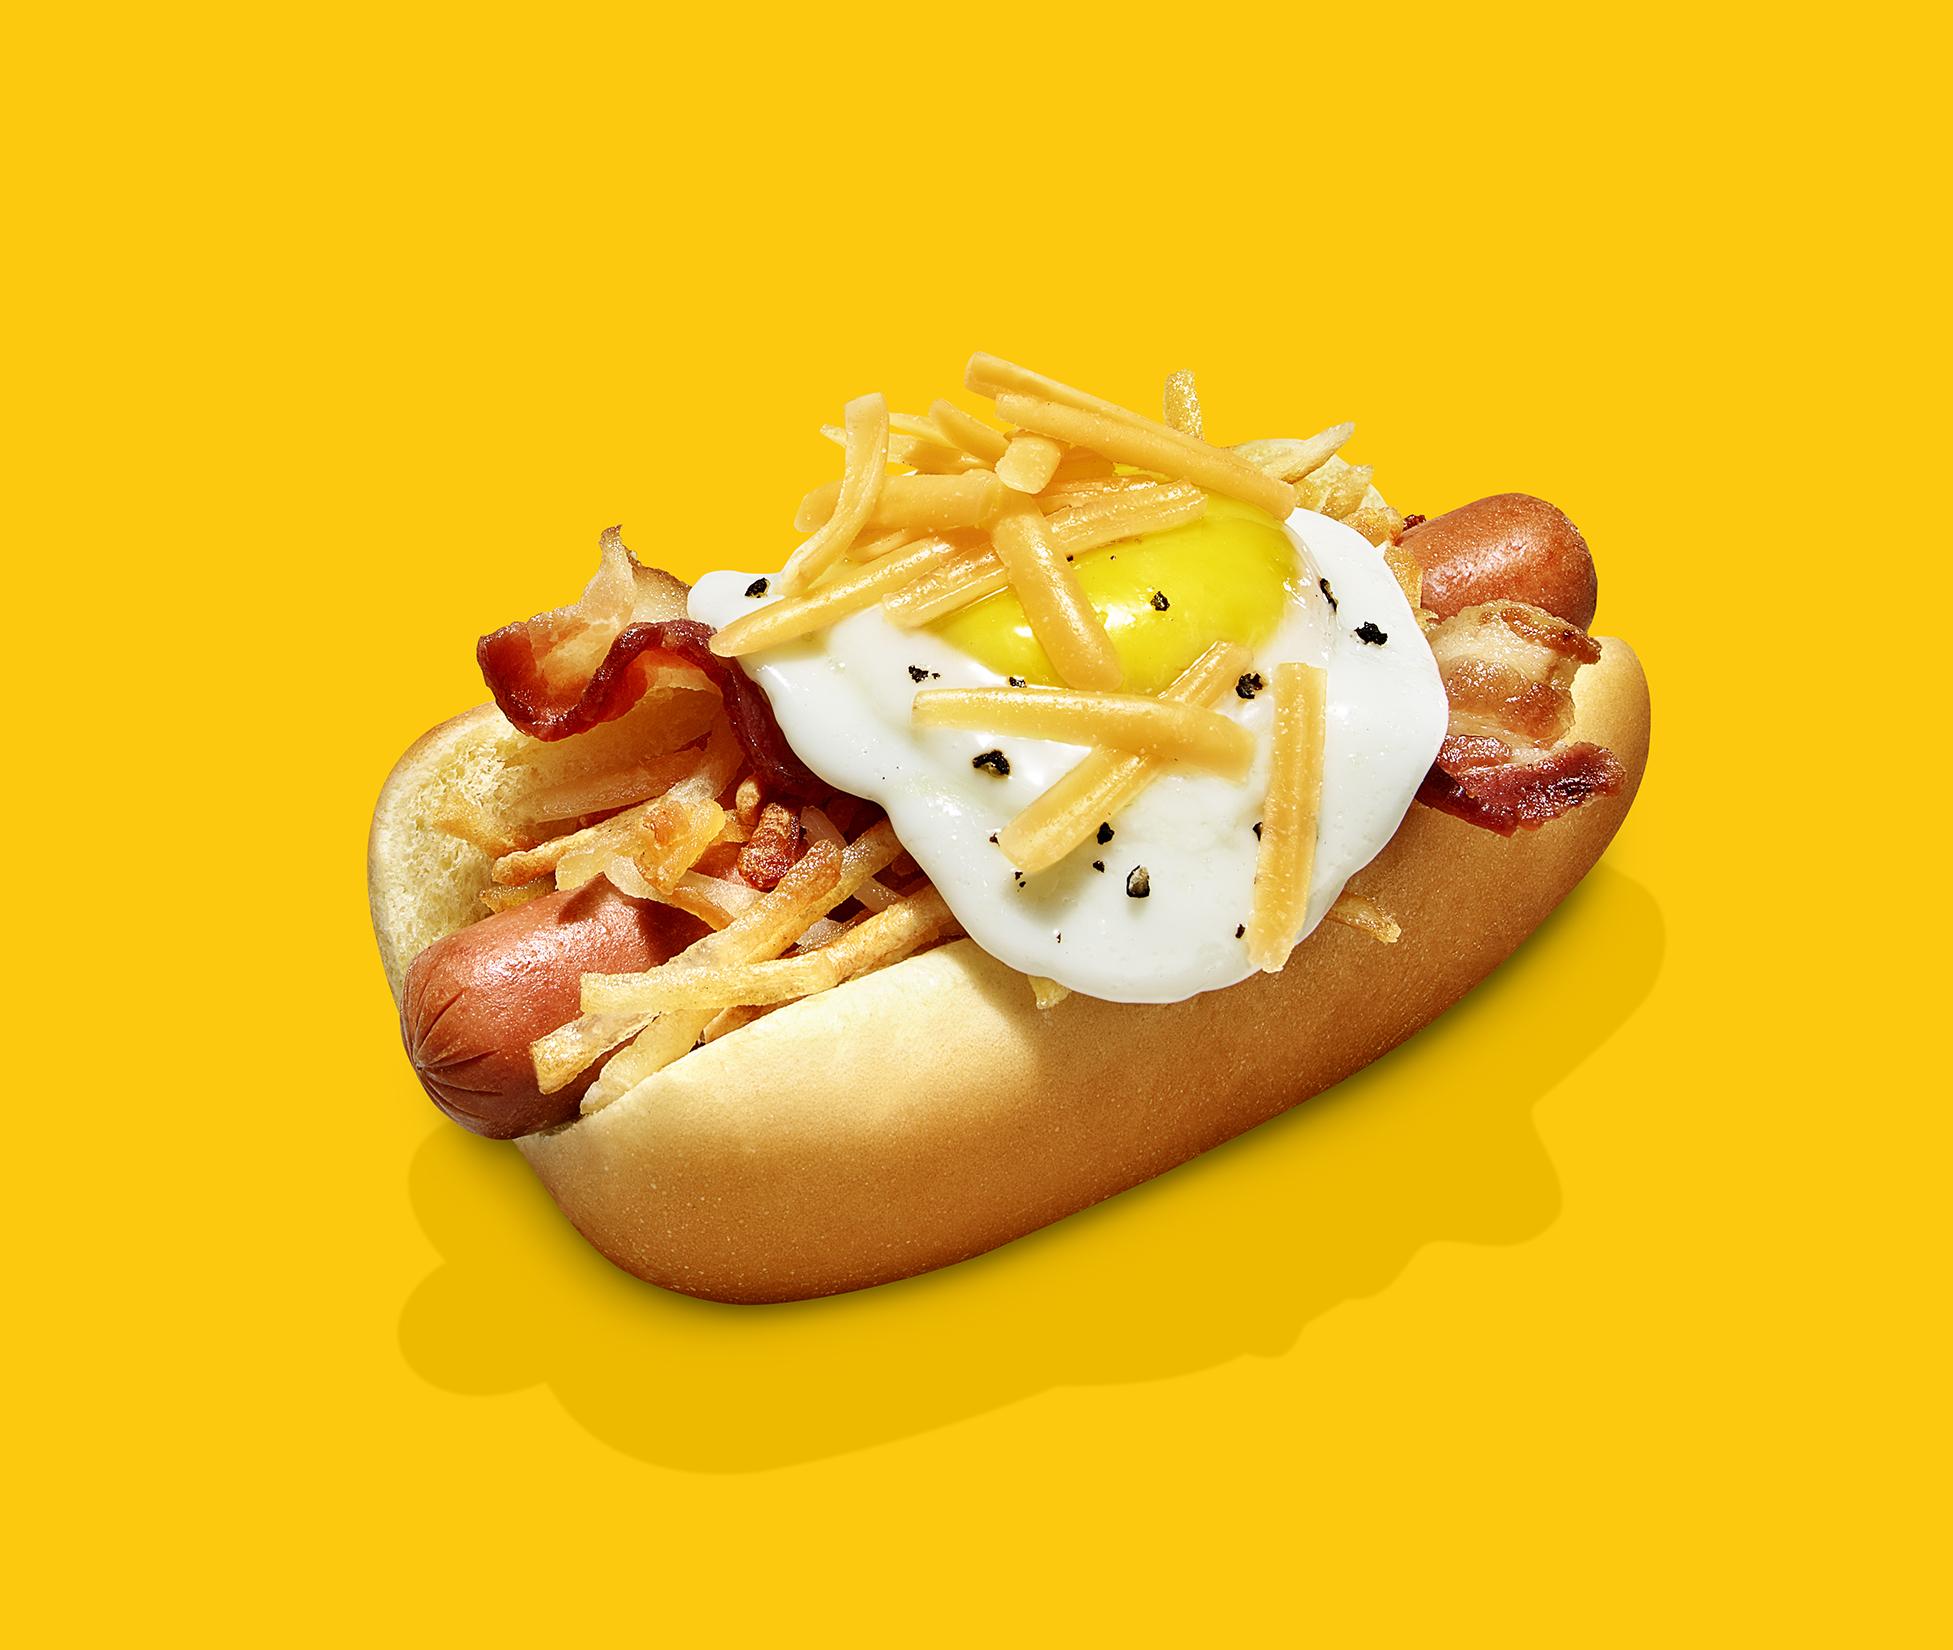 1803_Ball_Park_Hot_Dog_Breakfast_0619_working_preview_R2.jpg